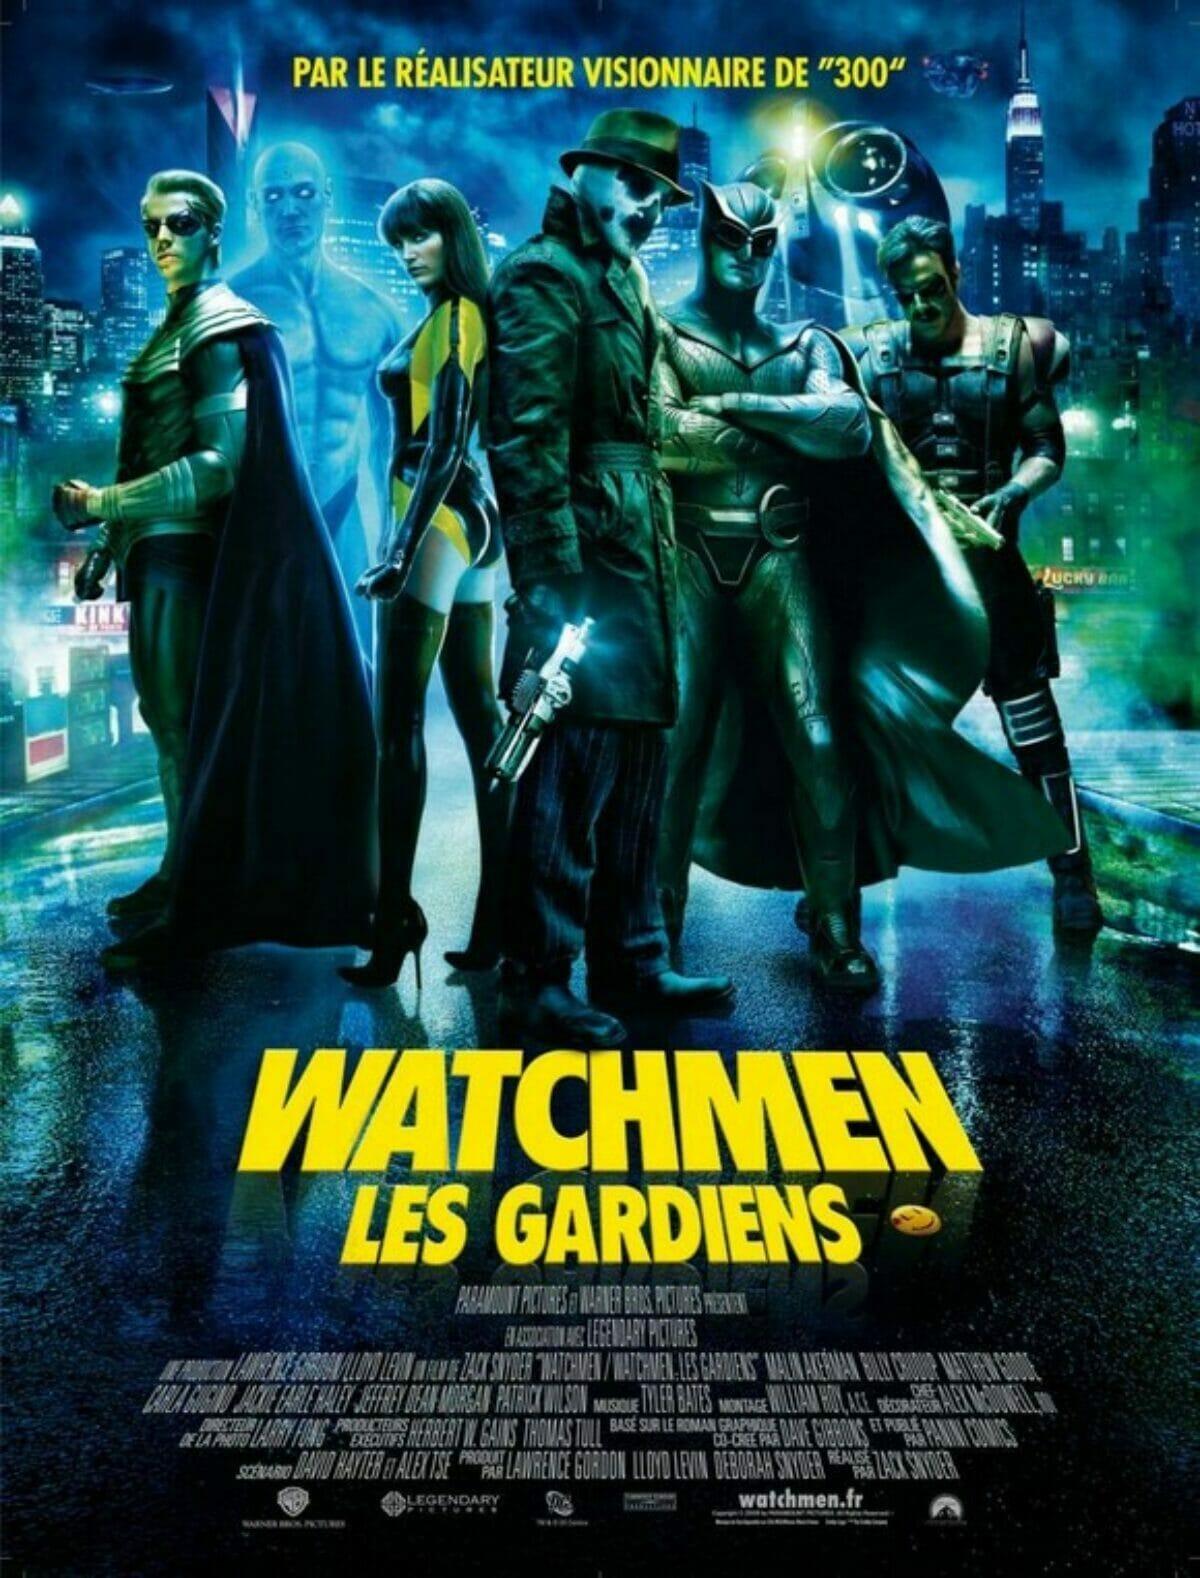 Watchmen-affiche-france